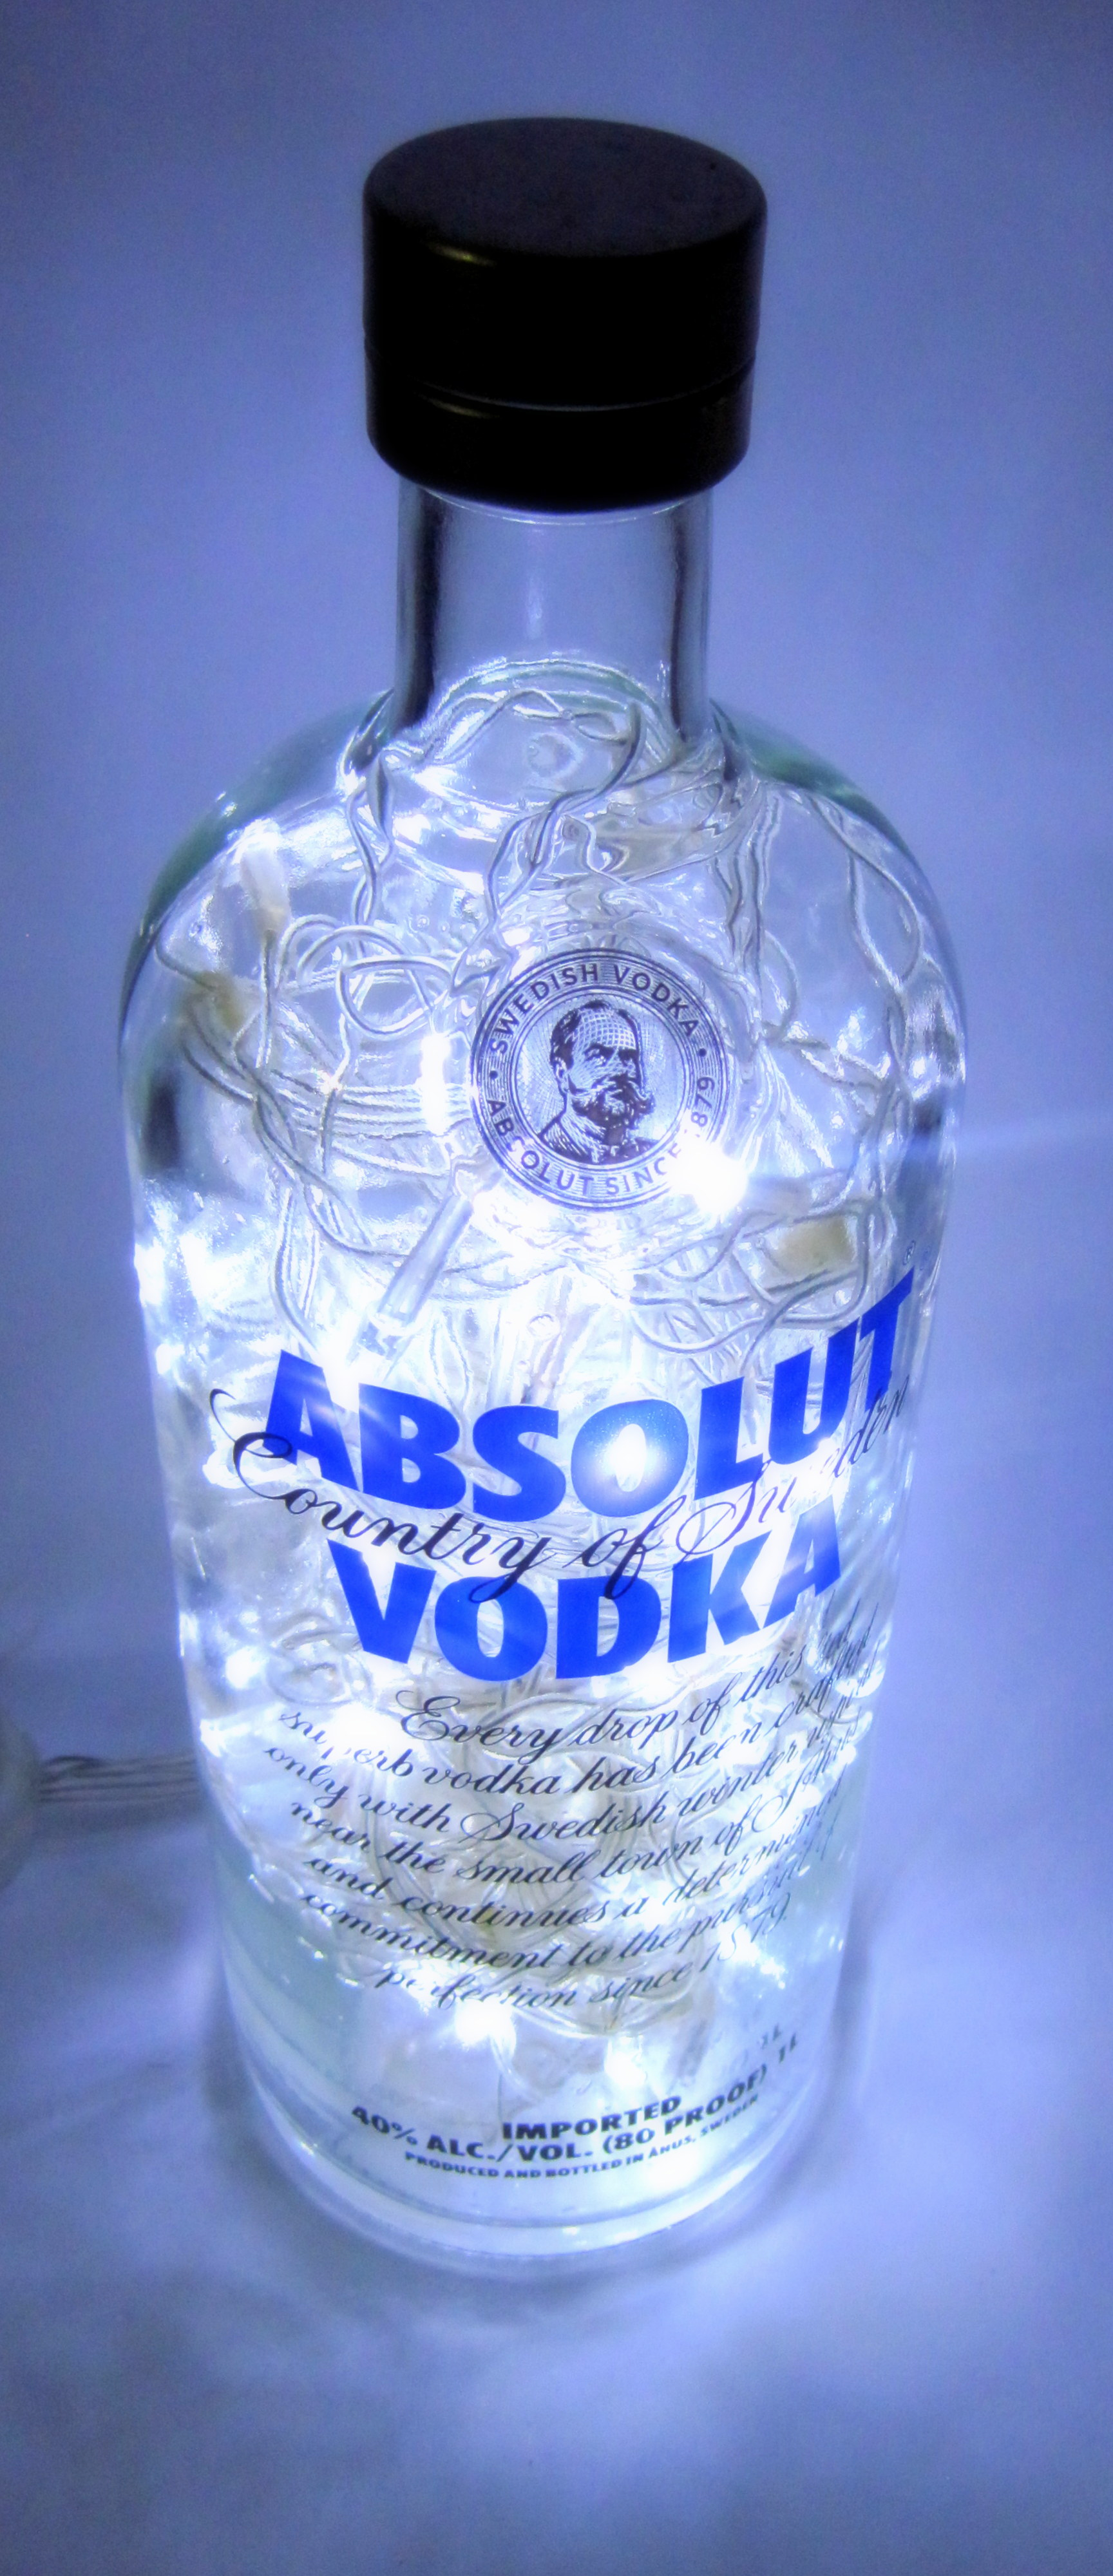 Coupon vodka